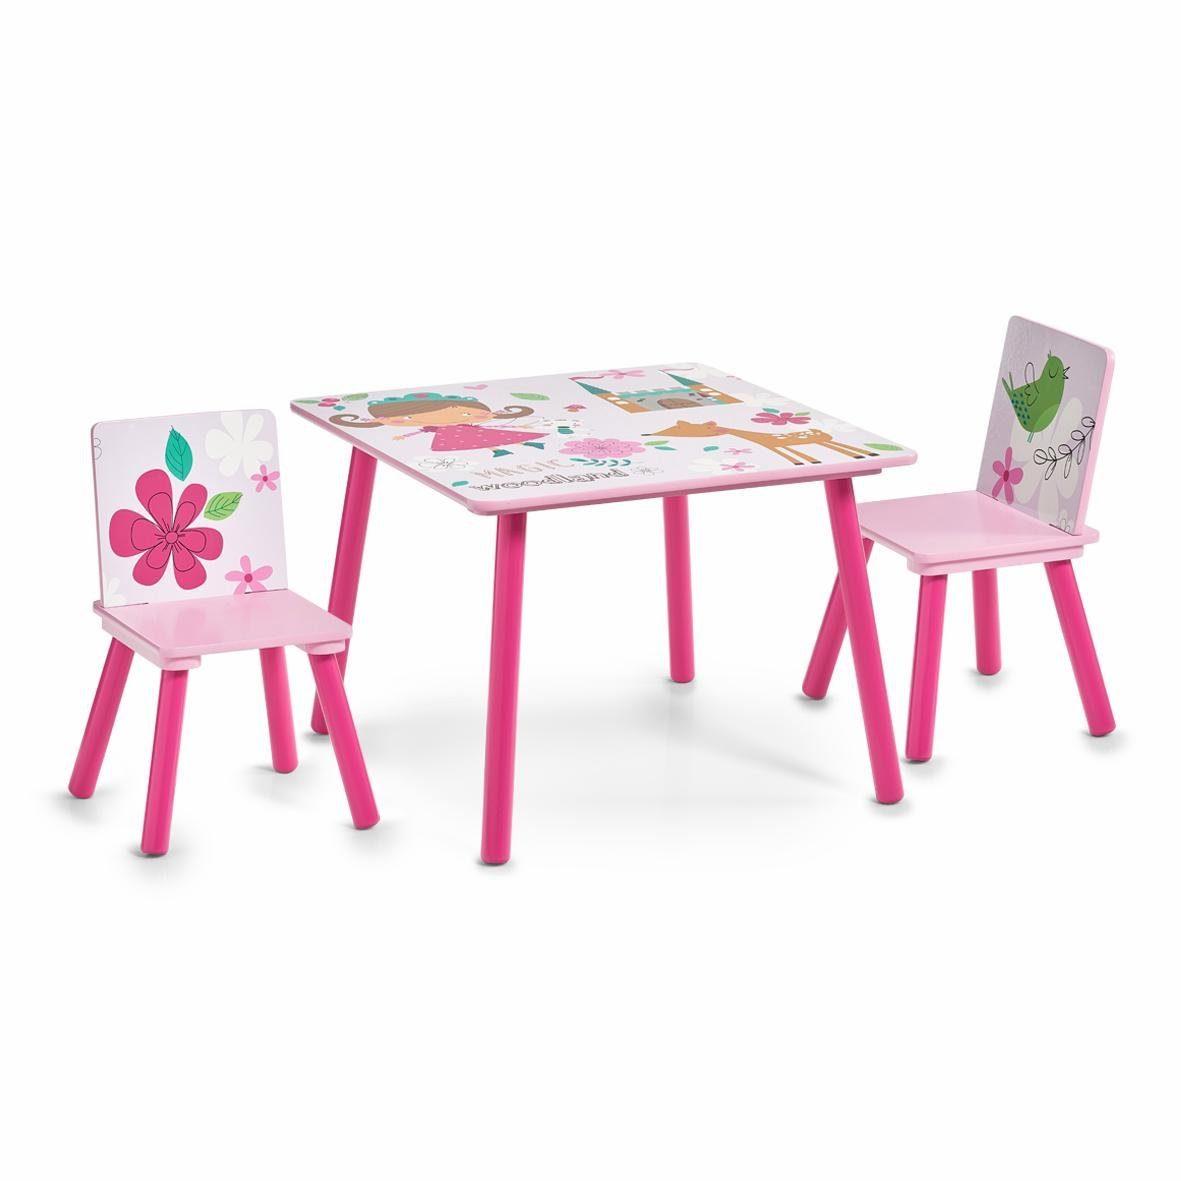 Home affaire Kinder-Sitzgarnitur »Girly«, 3-tlg.